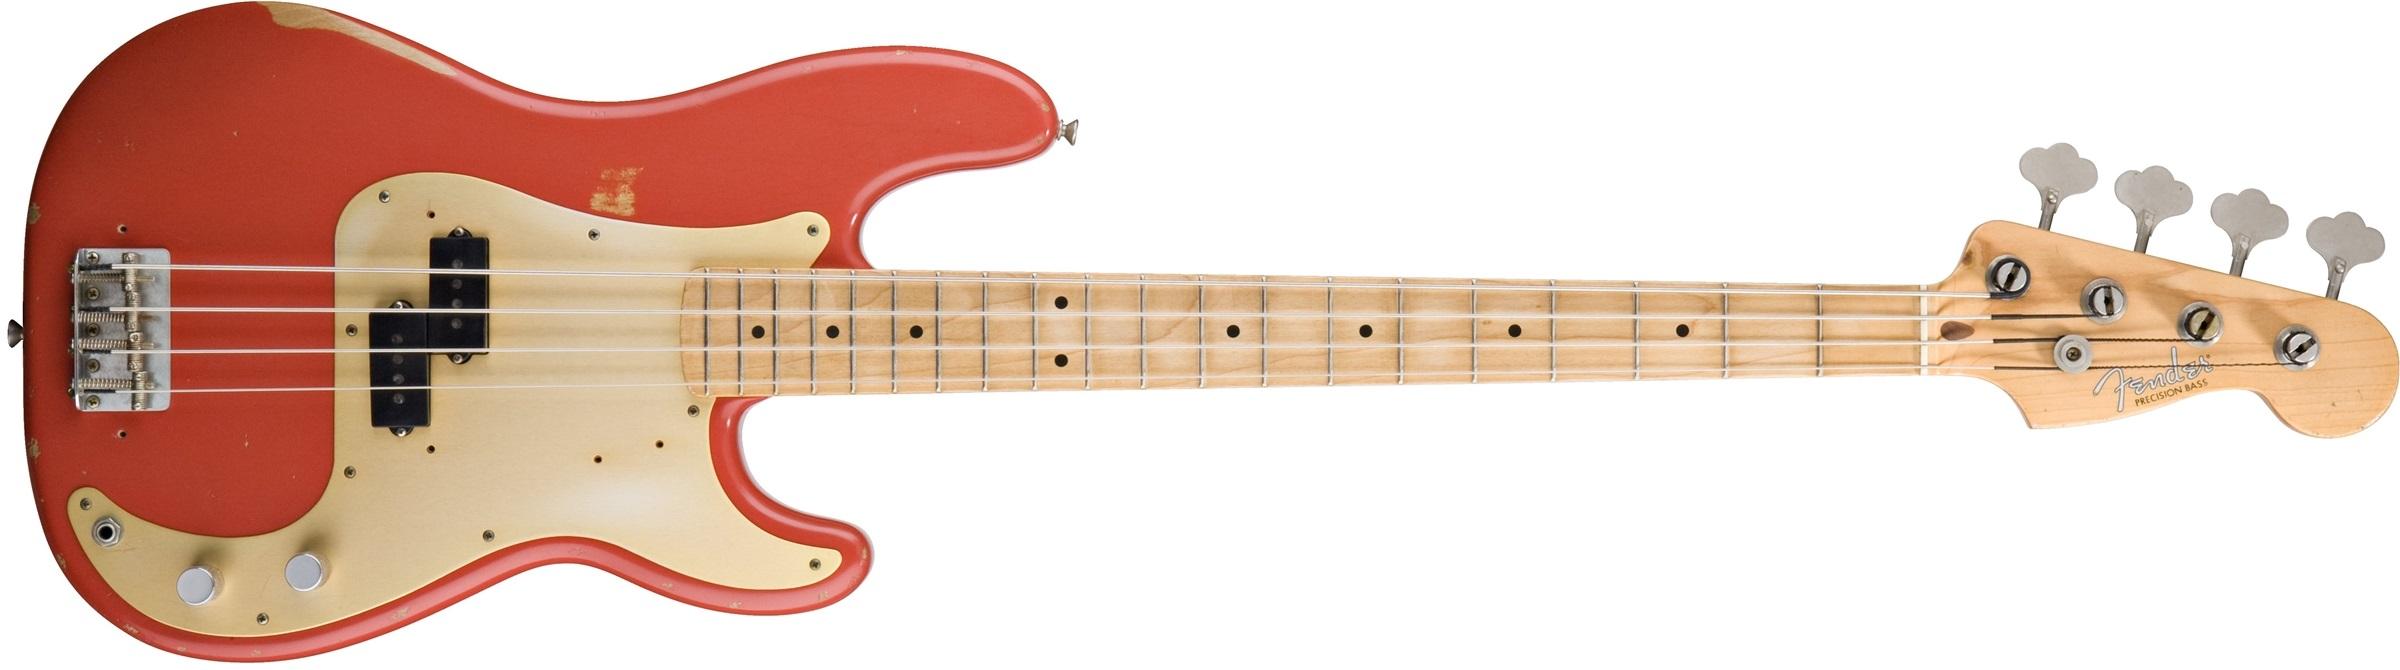 Fender Road Worn 50s Precision Bass MN FR